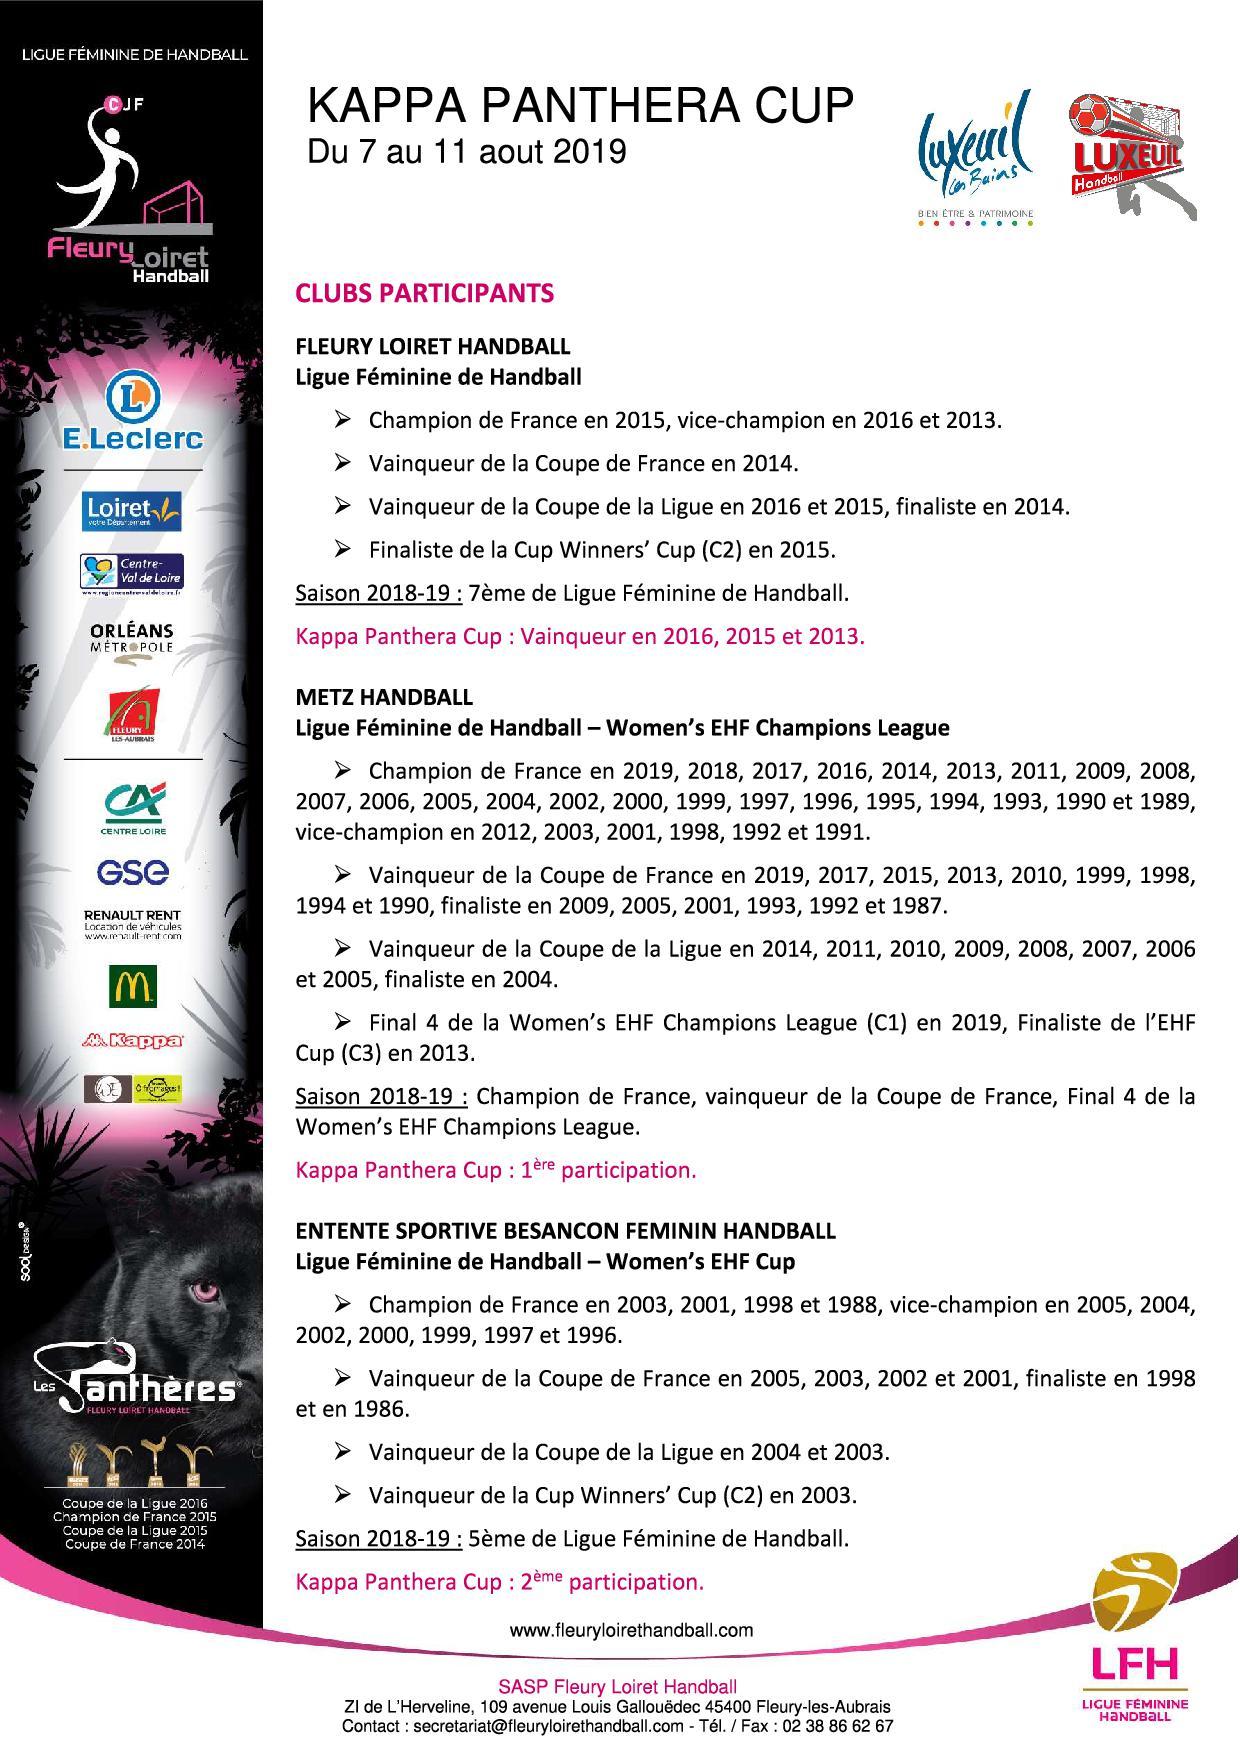 Communiqué Fleury Loiret Handball - Jeudi 20 juin 2019 - Communiqué Fleury Loiret Handball - Jeudi 20 juin 20194.jpg